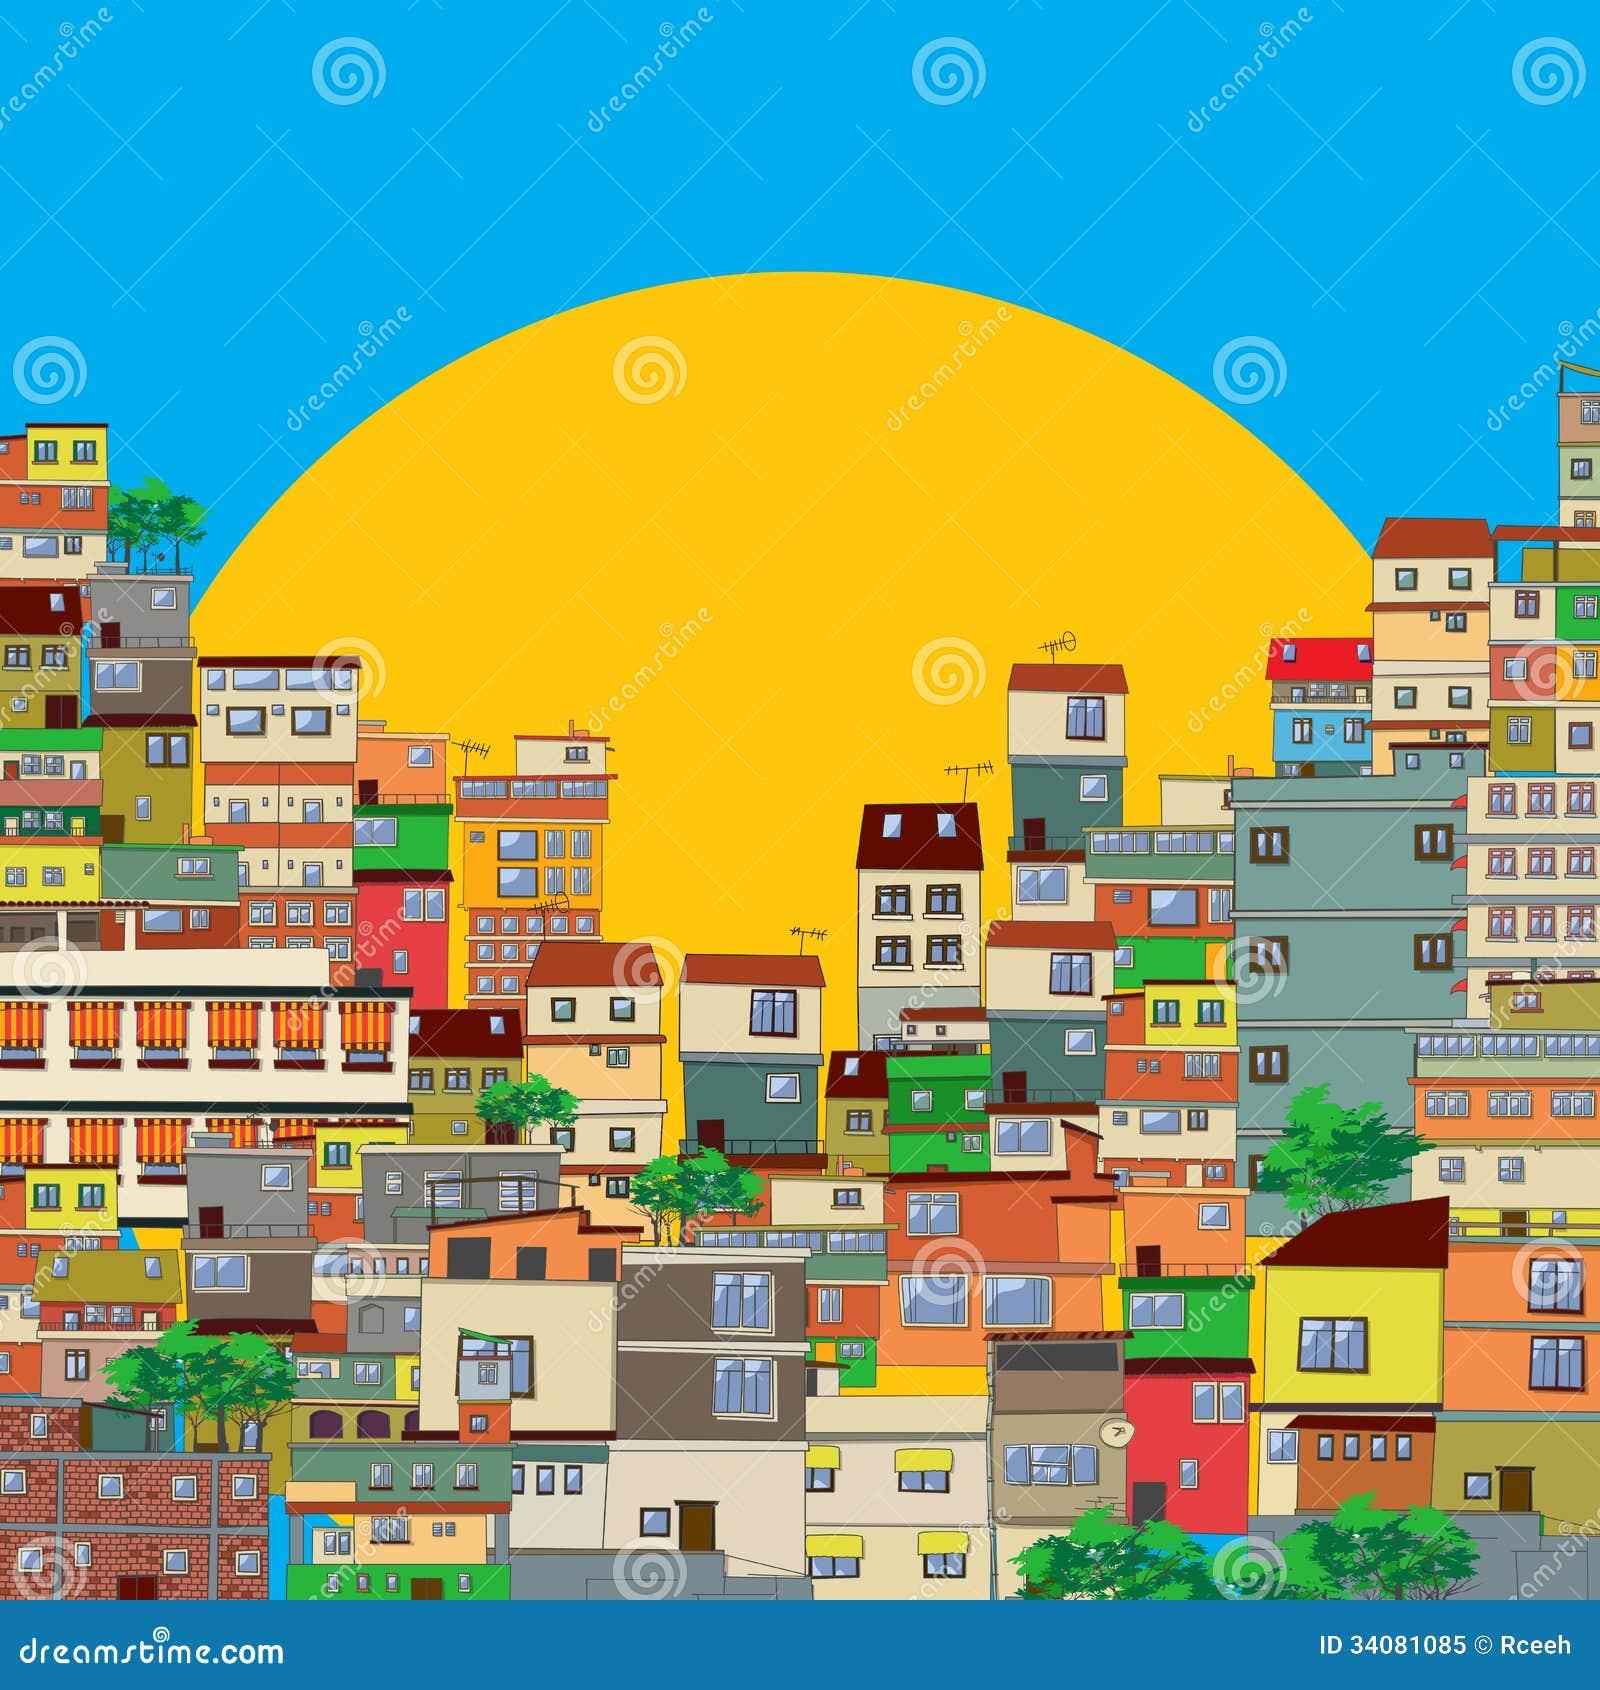 Favela Foto de Stock Royalty Free - Imagem: 34081085